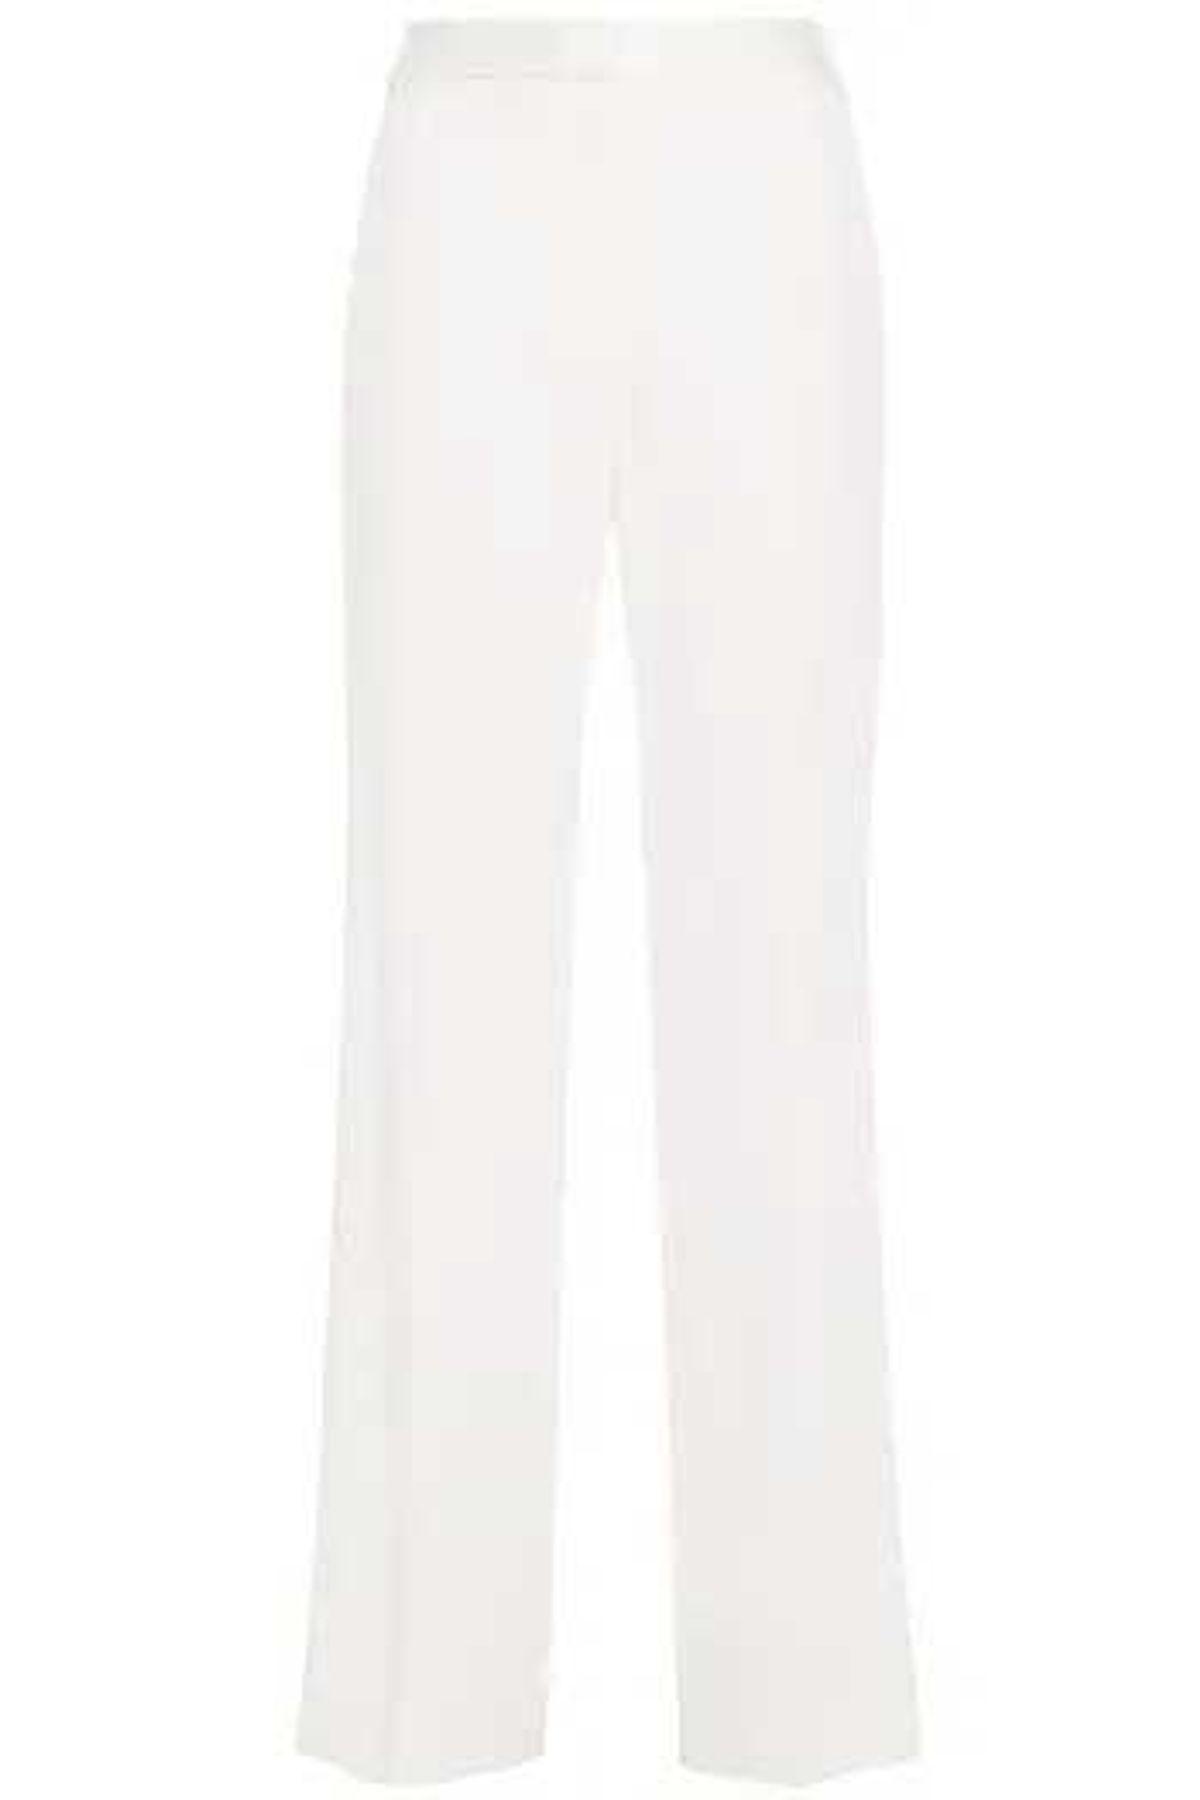 diane von furstenberg satin trimmed stretch crepe straight leg pants